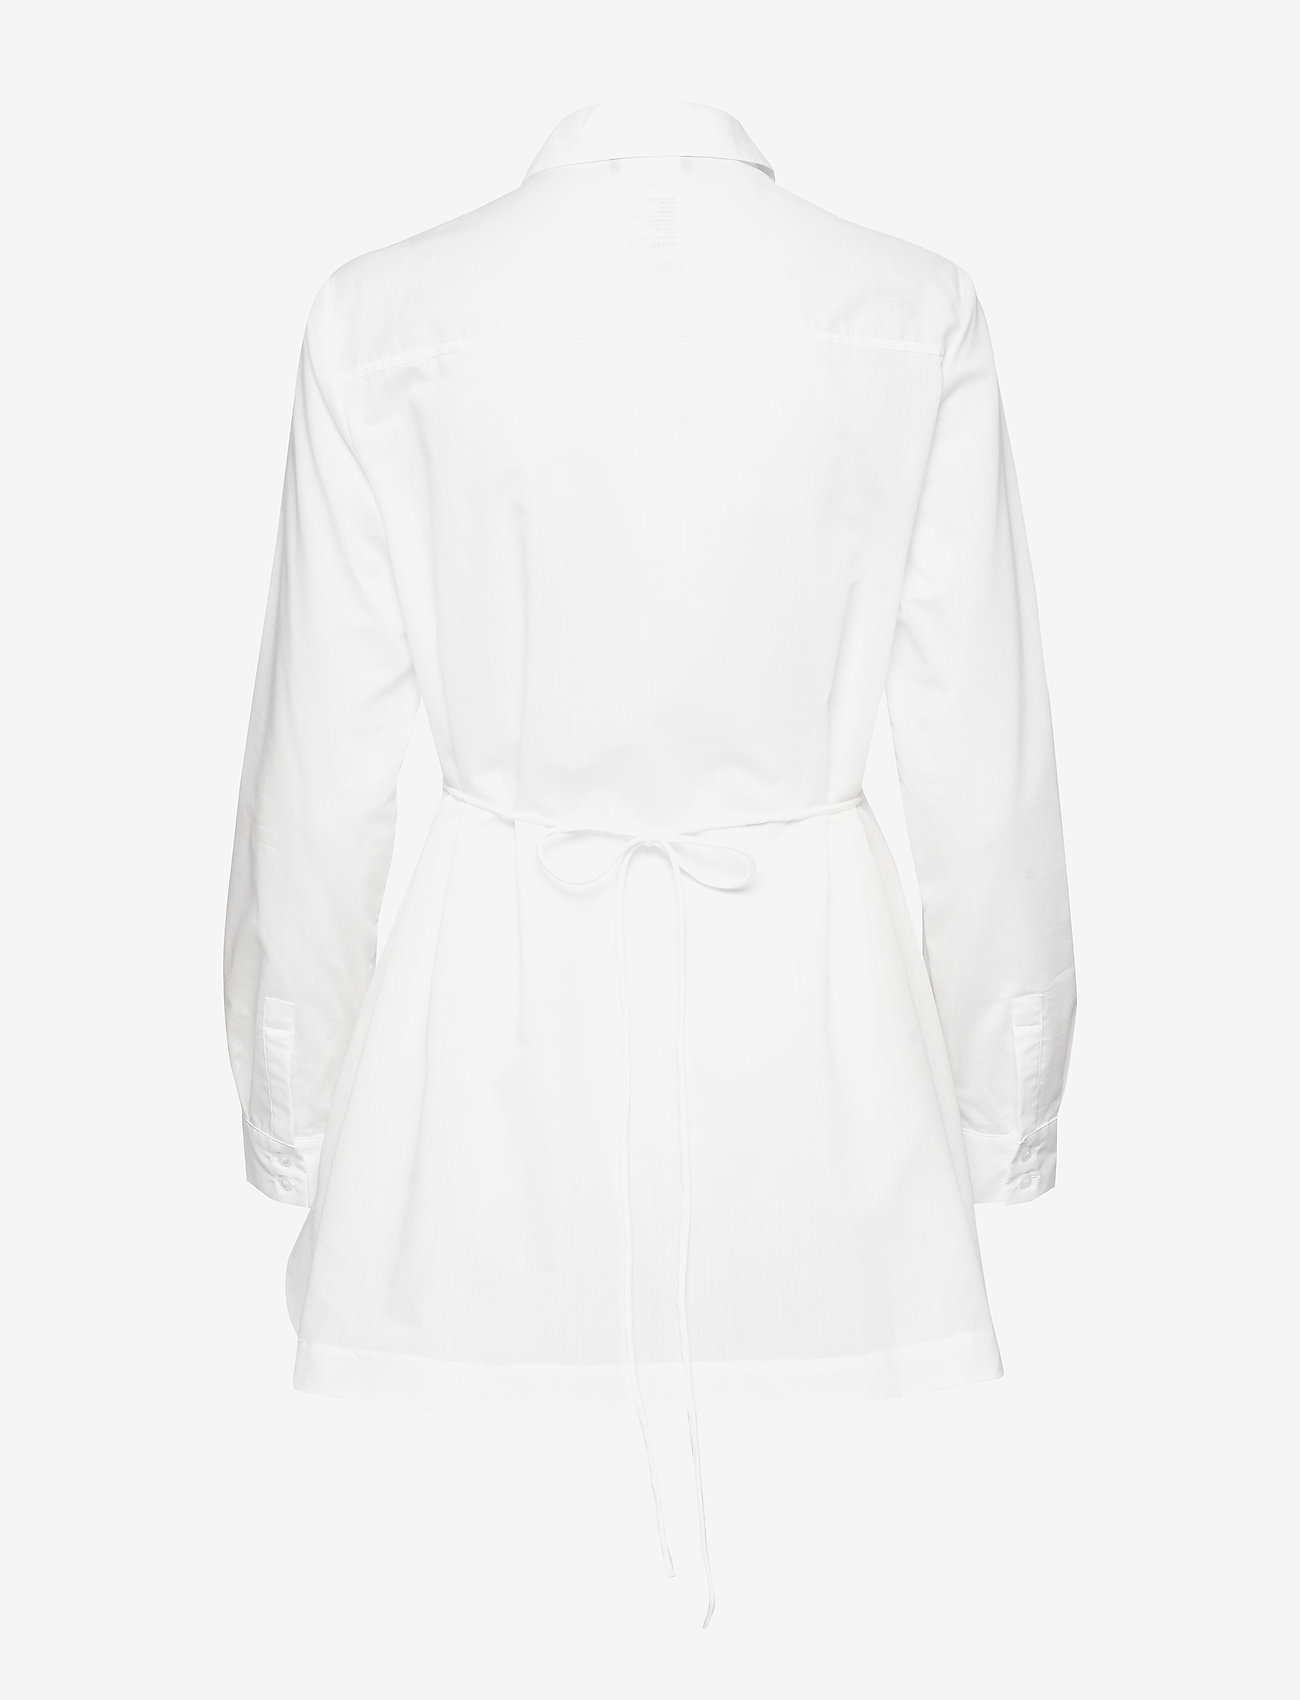 Catena (White) - Max&Co. VM9K7K